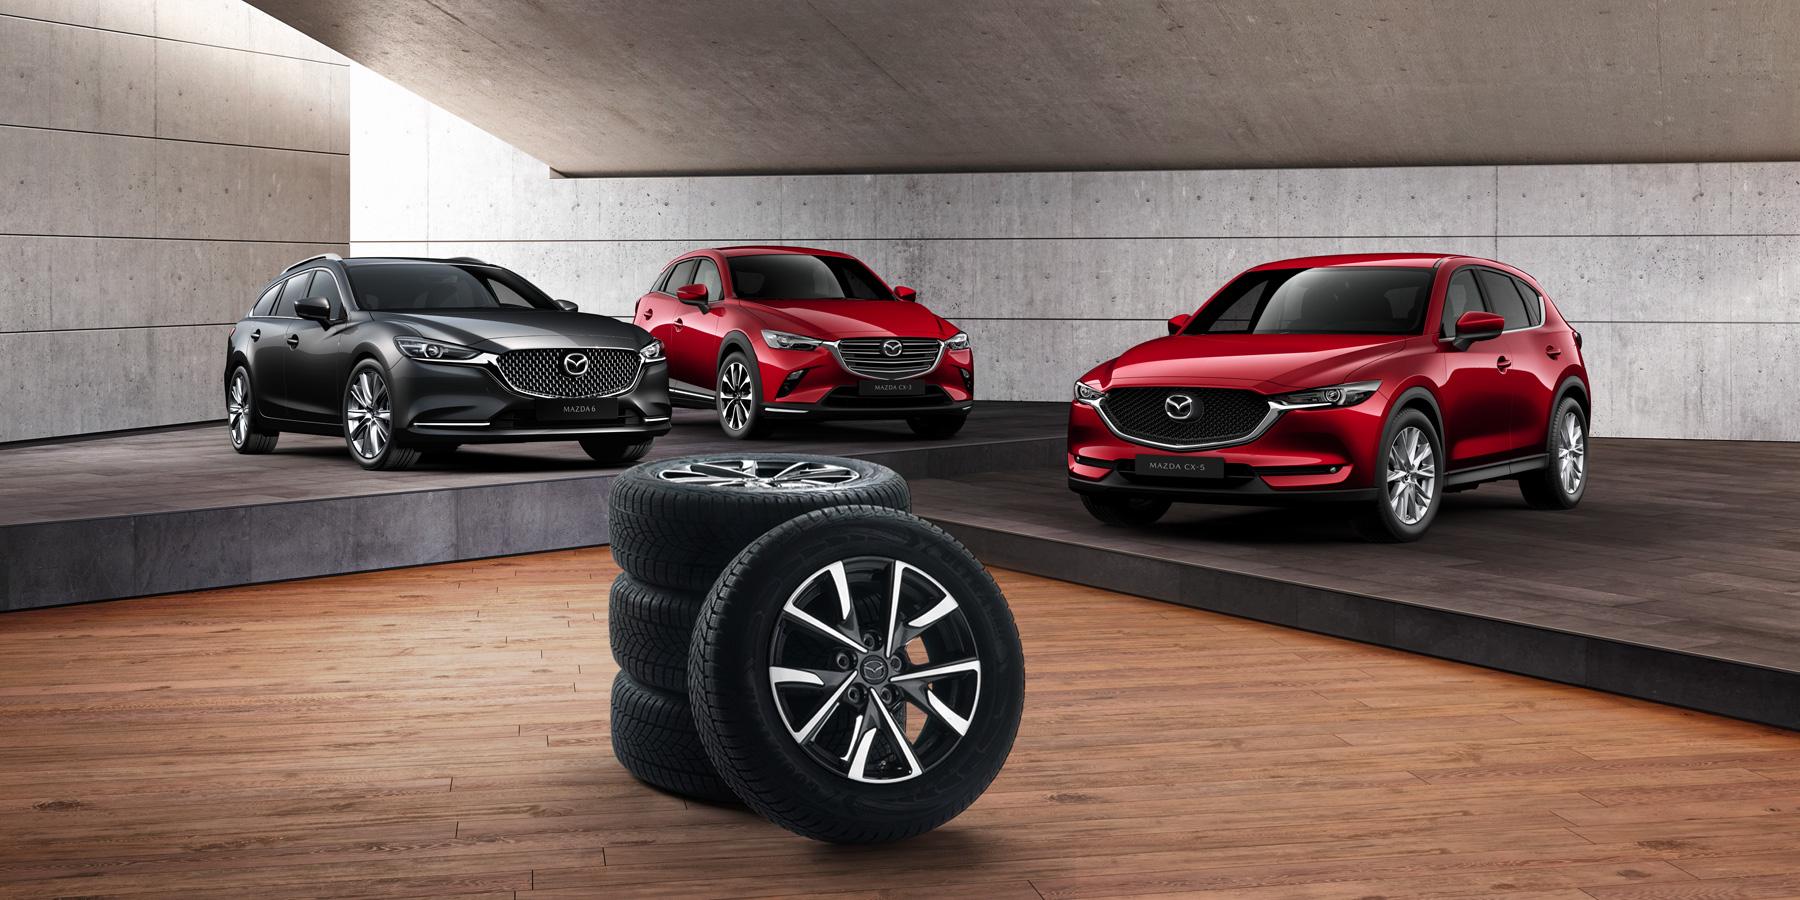 https://marina.mazda.at/wp-content/uploads/sites/84/2019/08/Mazda_ReifenAktion2019_1800x900.jpg